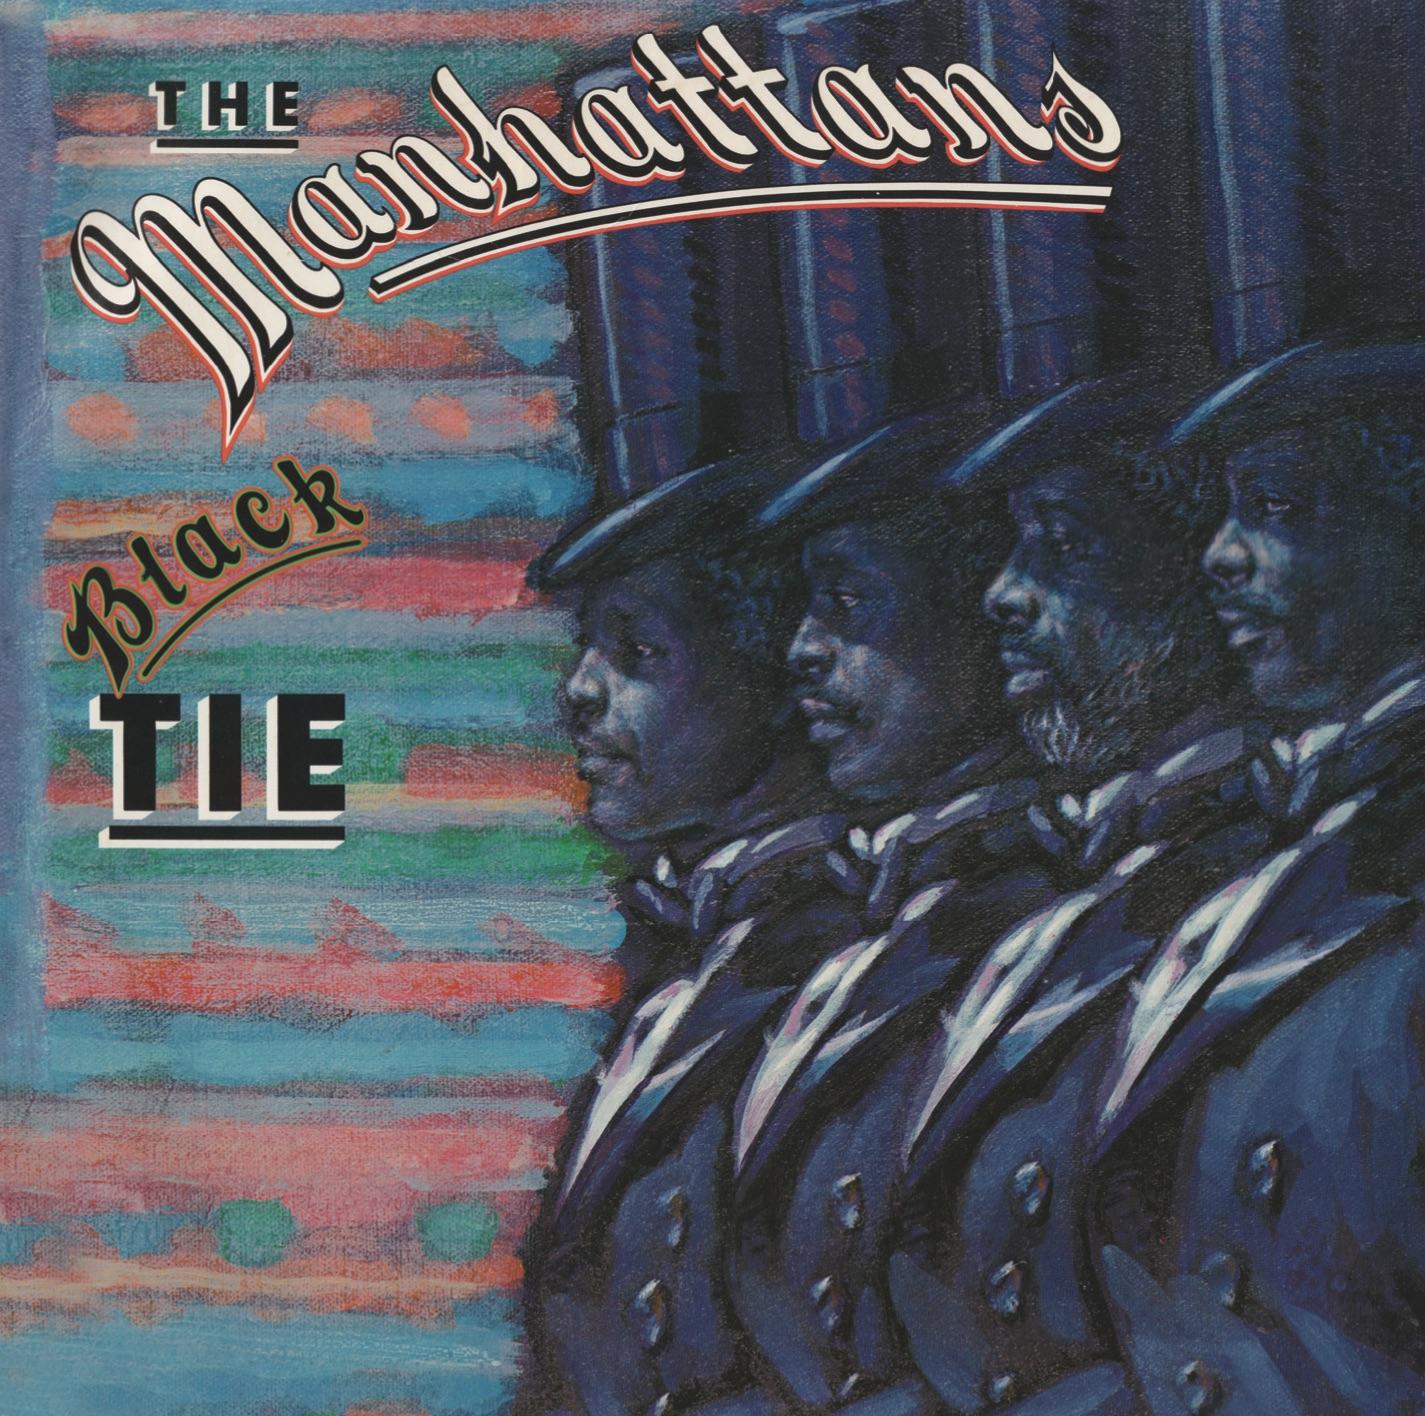 Black Tie (Expanded Version)